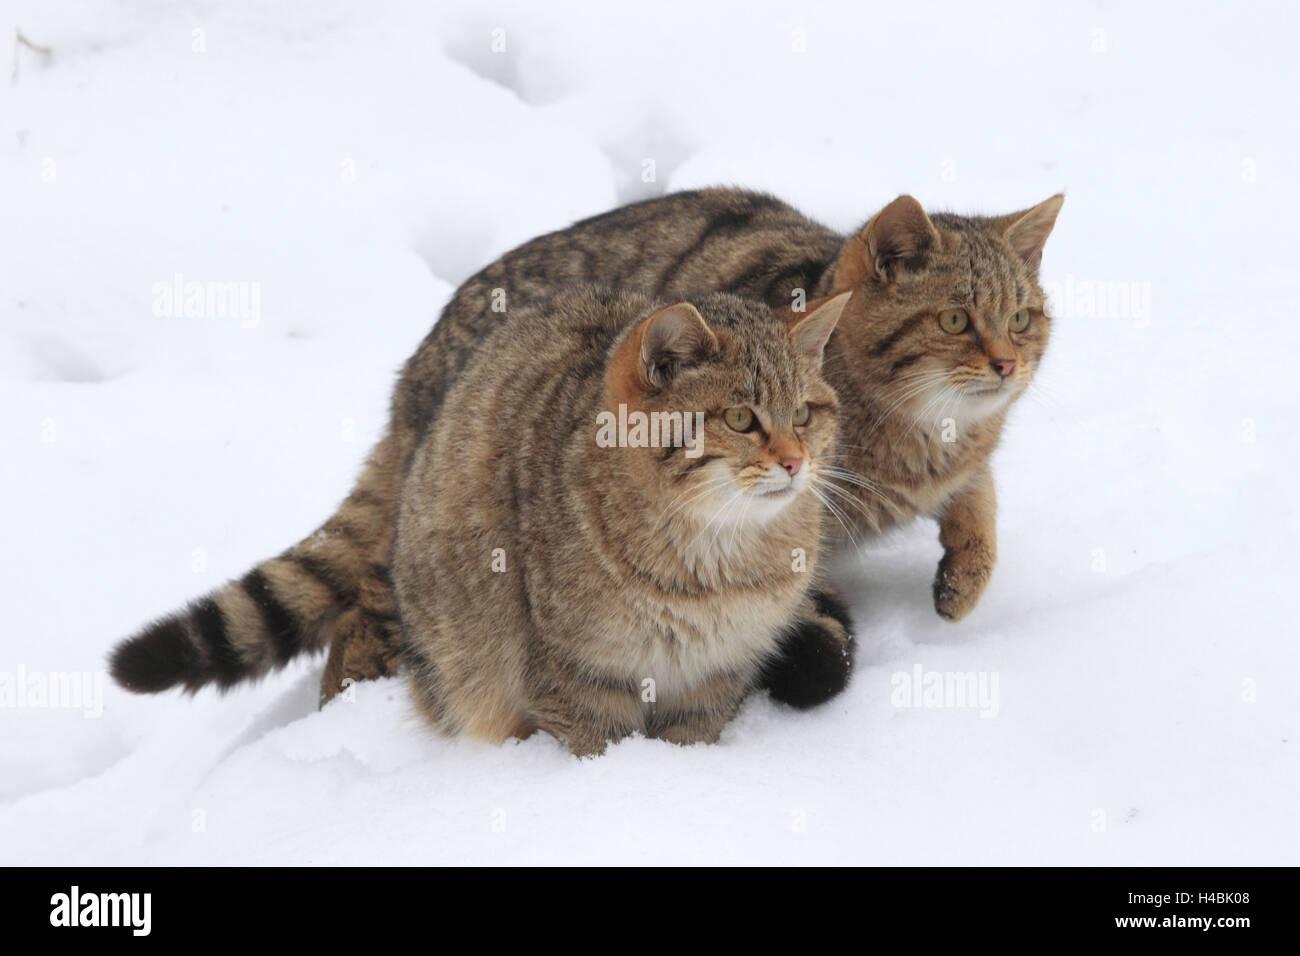 Dos gatos monteses europeos en la nieve. Foto de stock